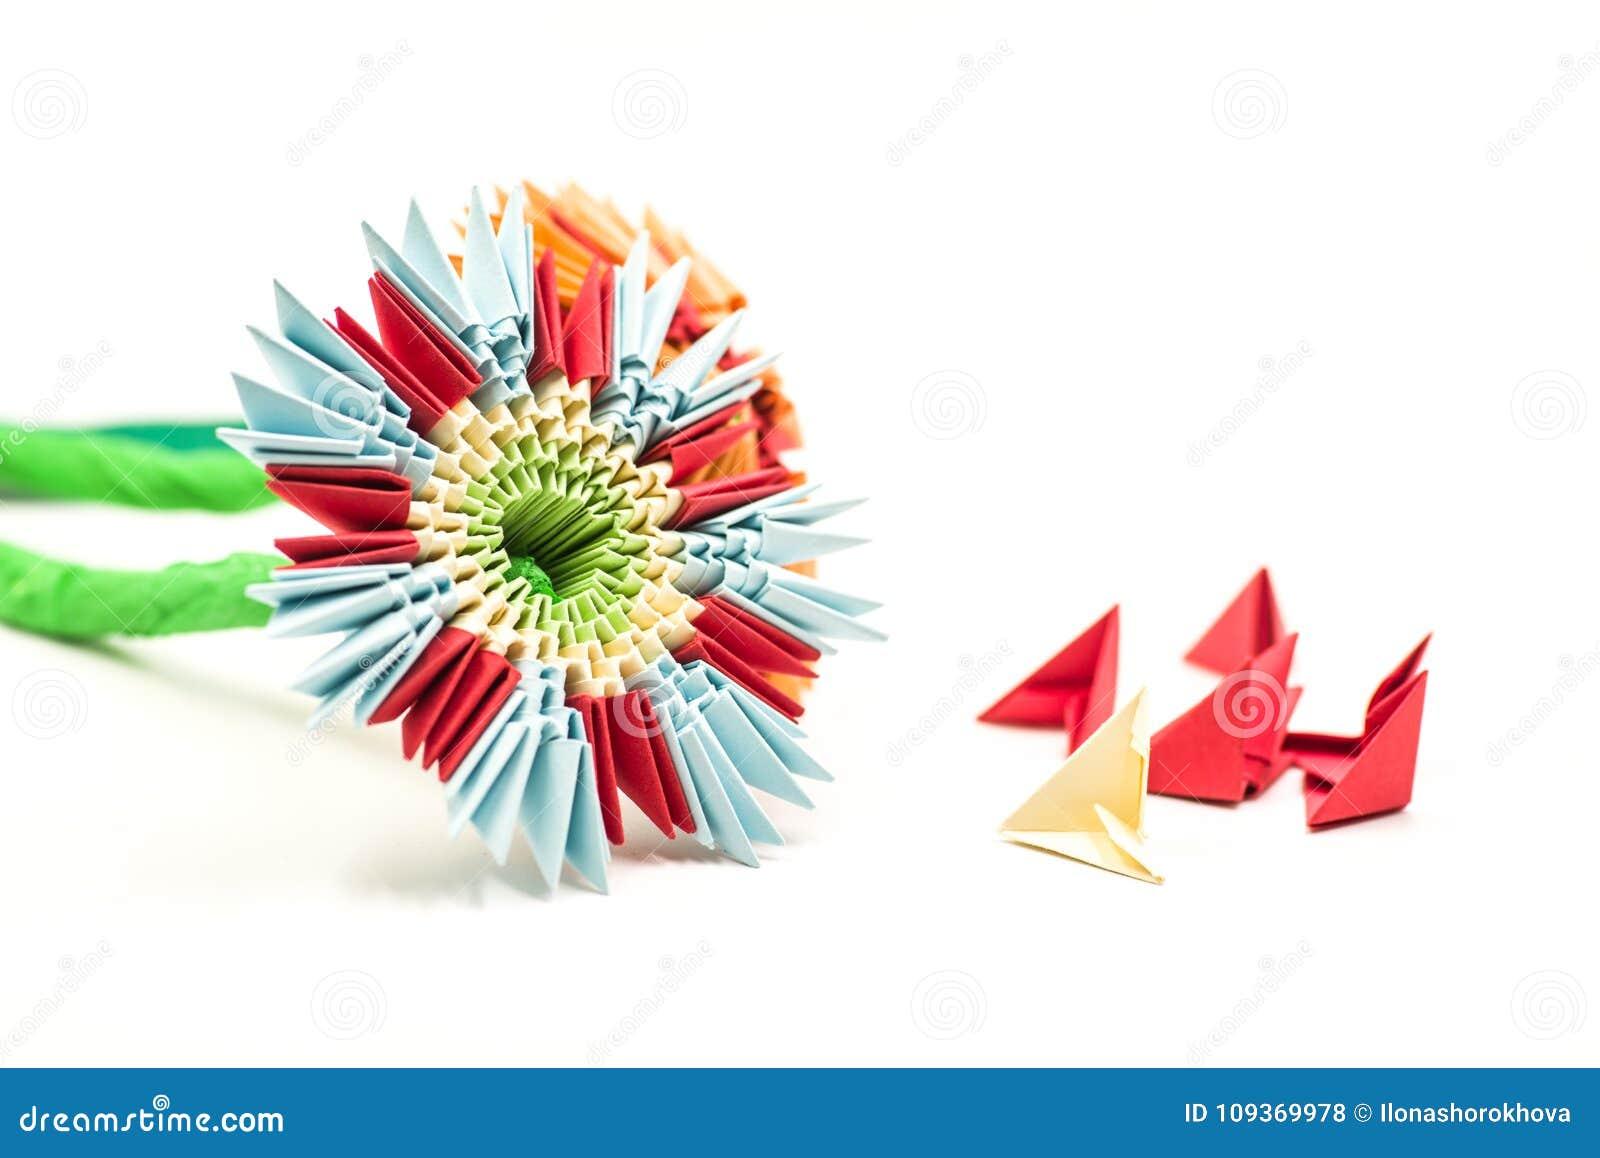 Modular Origami Flower With Blocks Isolated On White Background